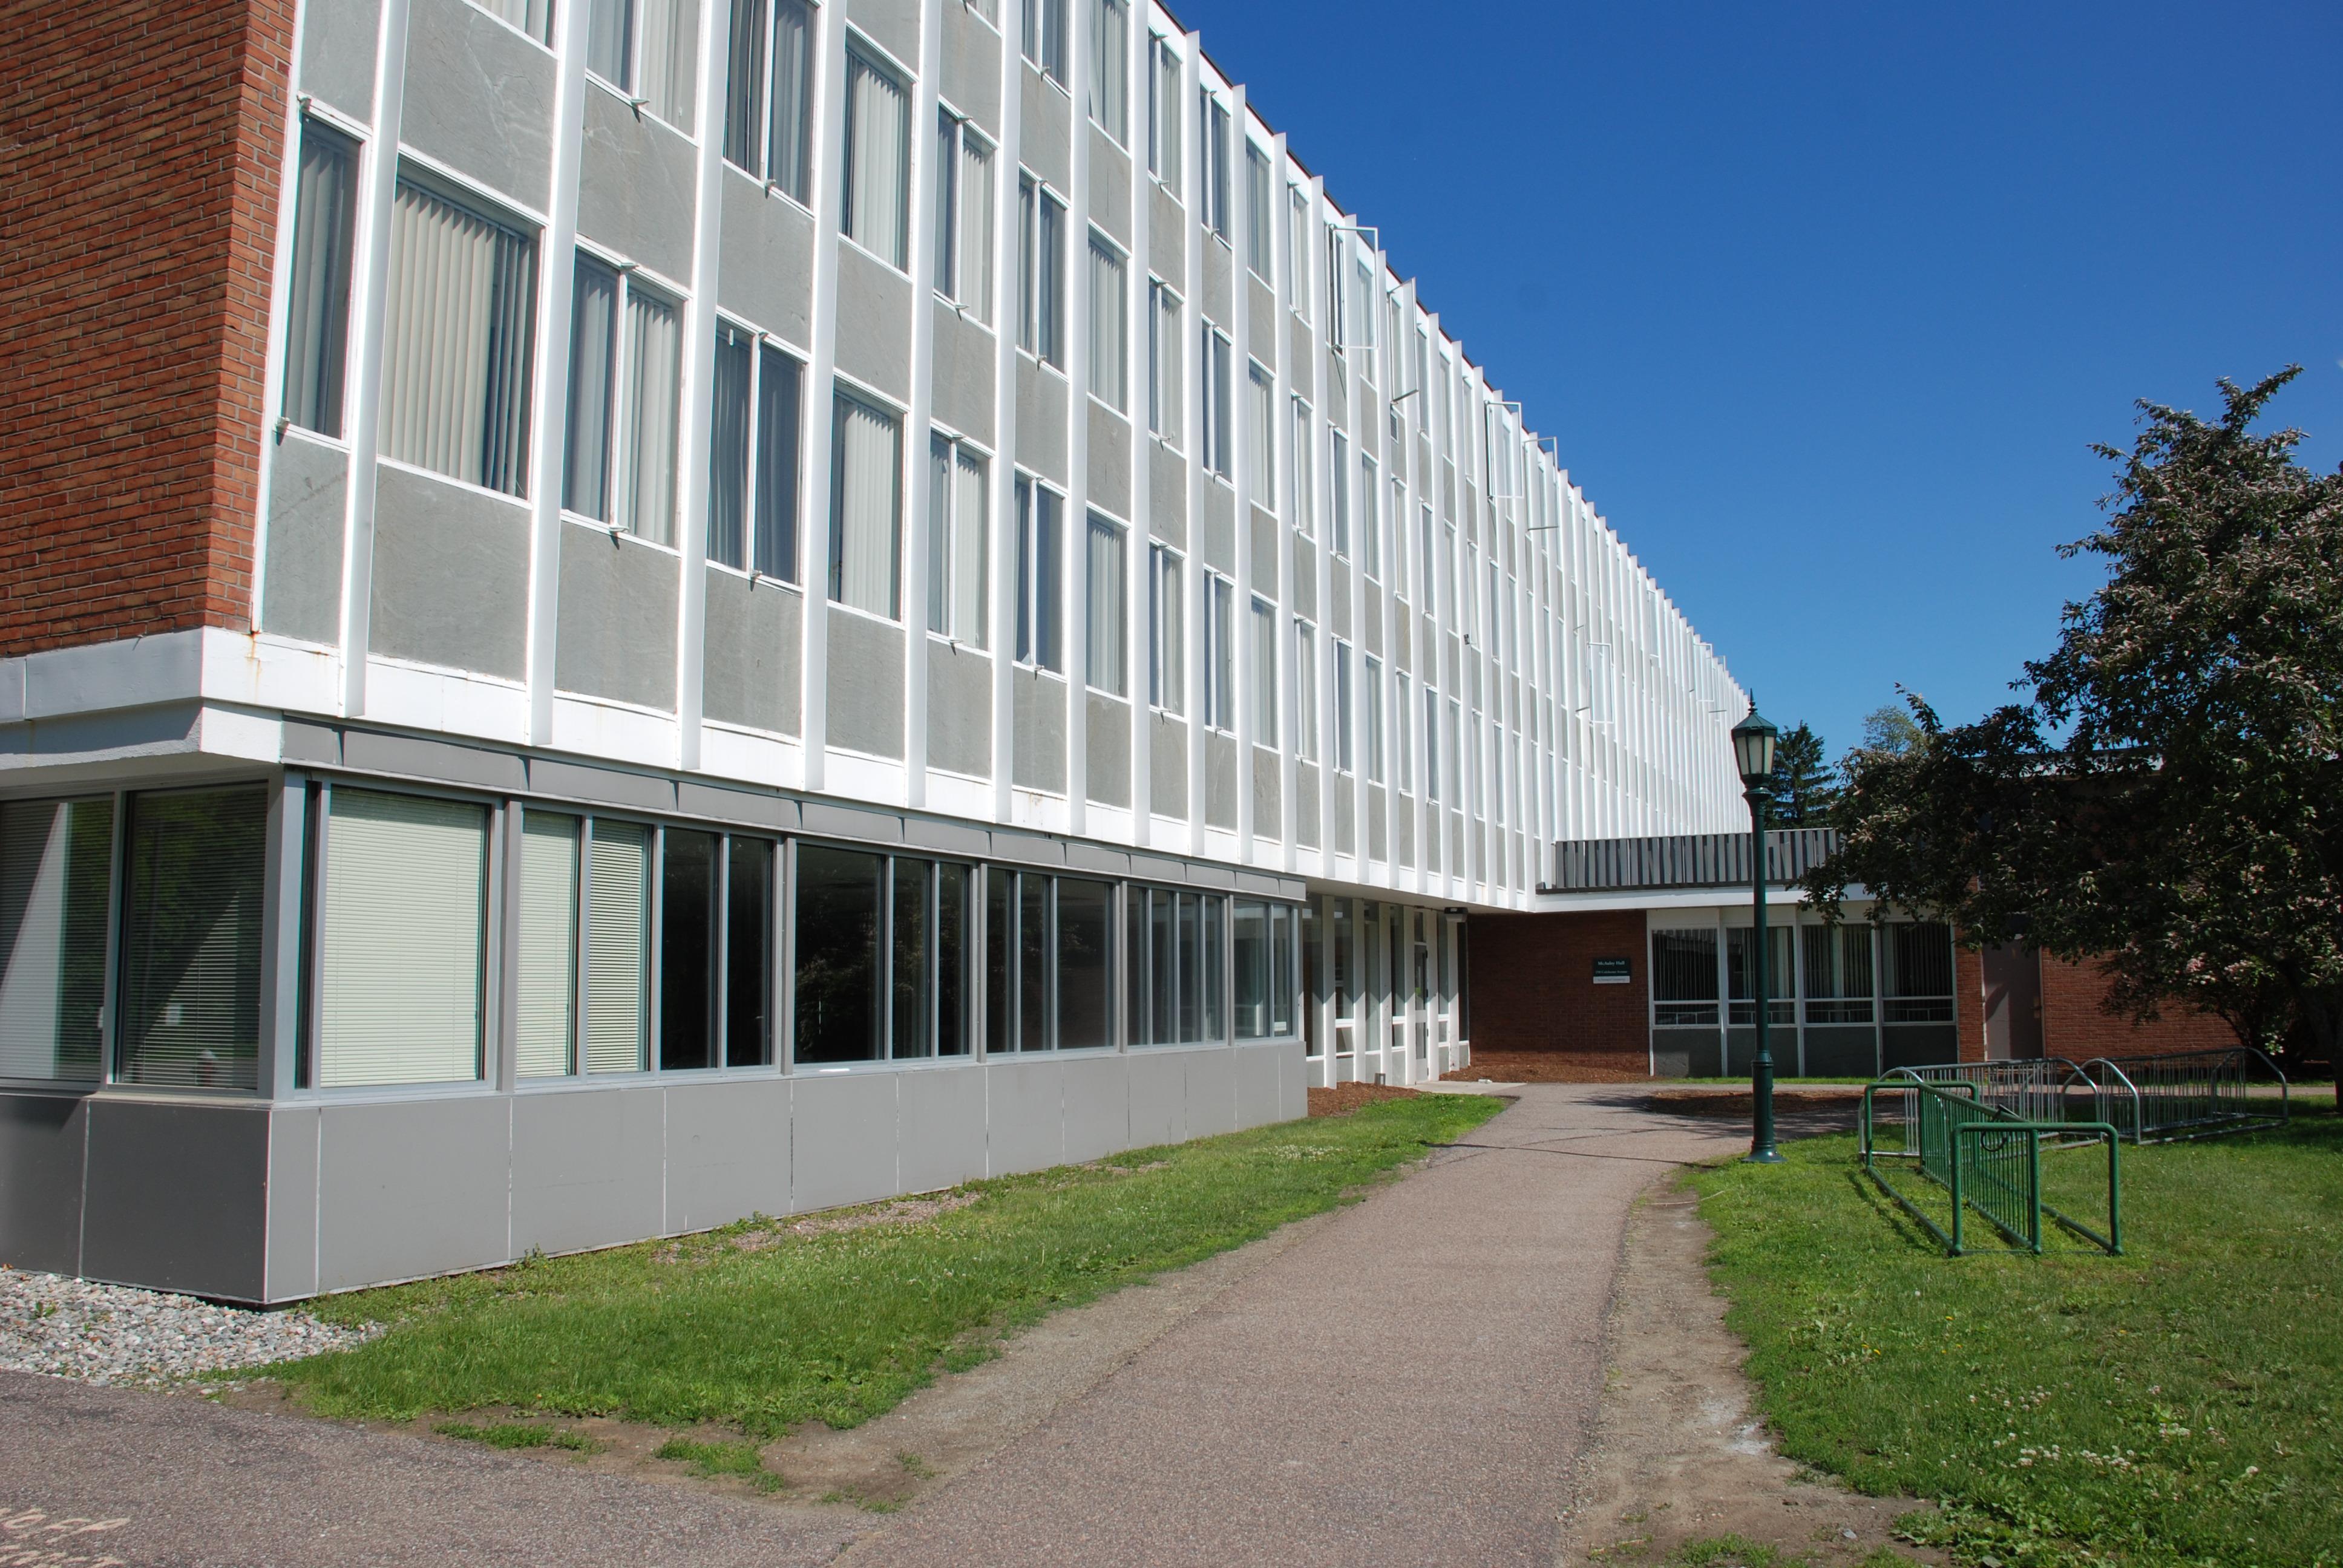 McAuley Hall